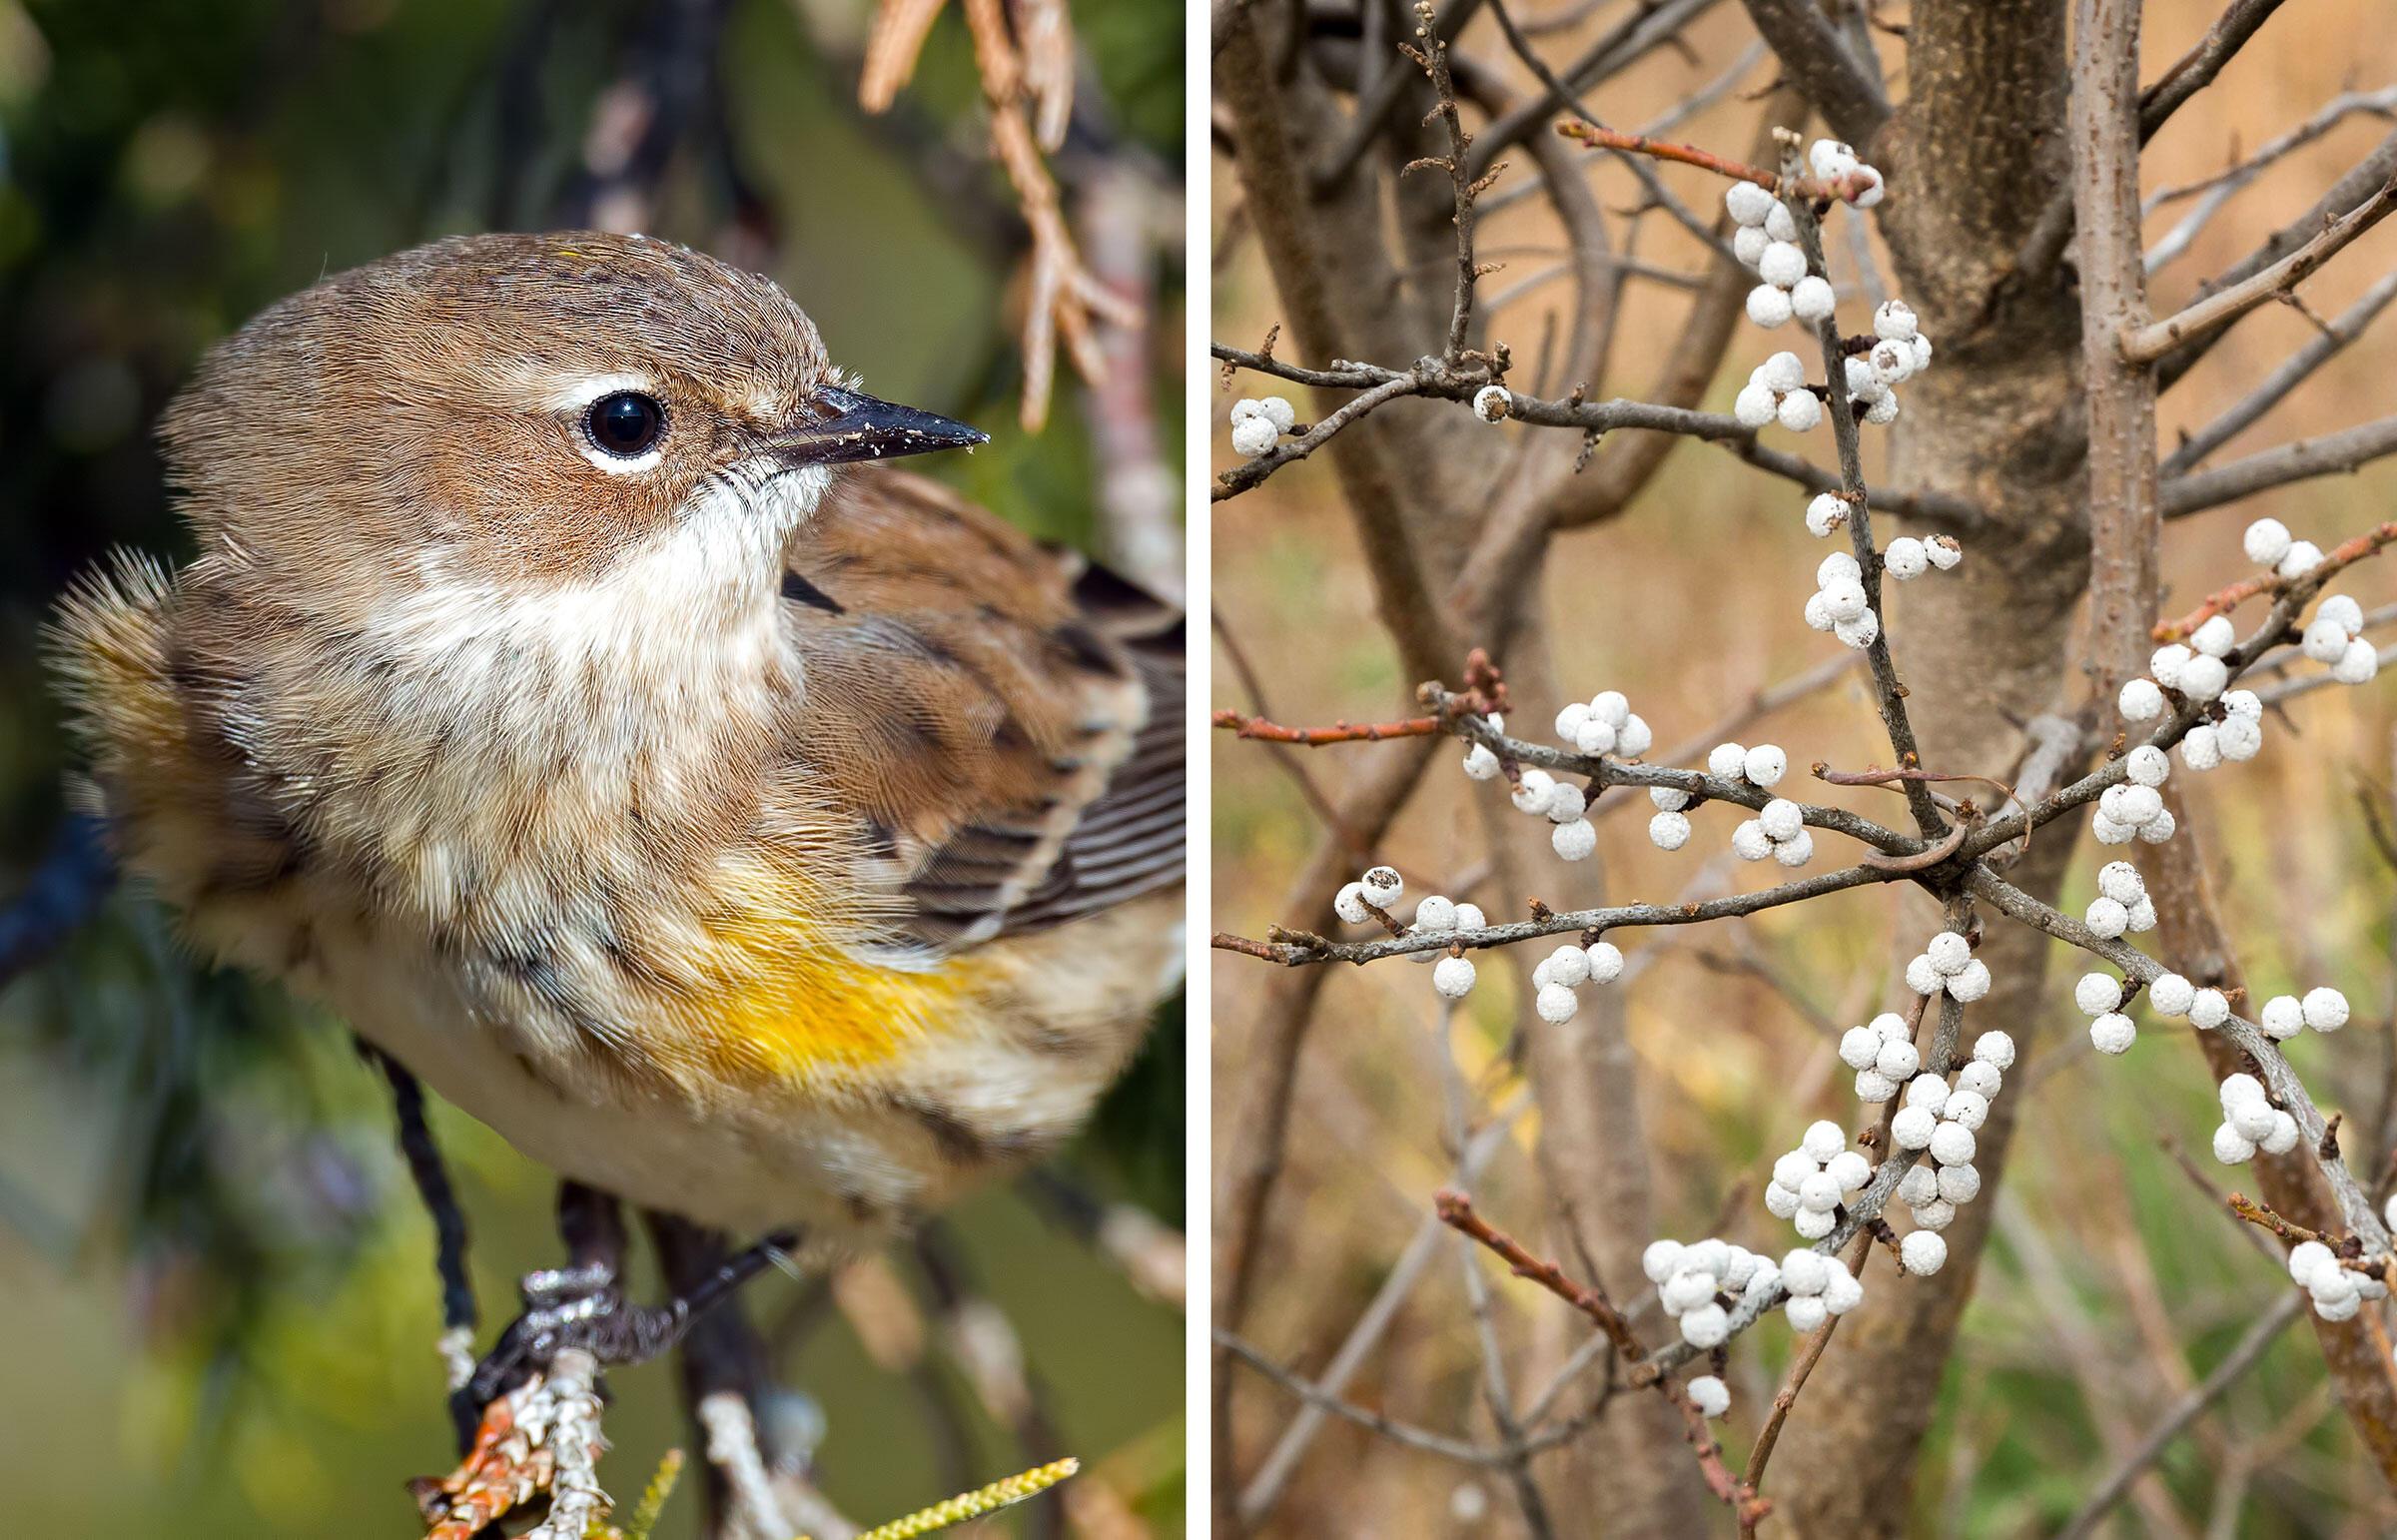 From left: Yellow-rumped Warbler. Photo: Brian Kushner; Bayberry. Photo: Elizabeth Wake/Alamy